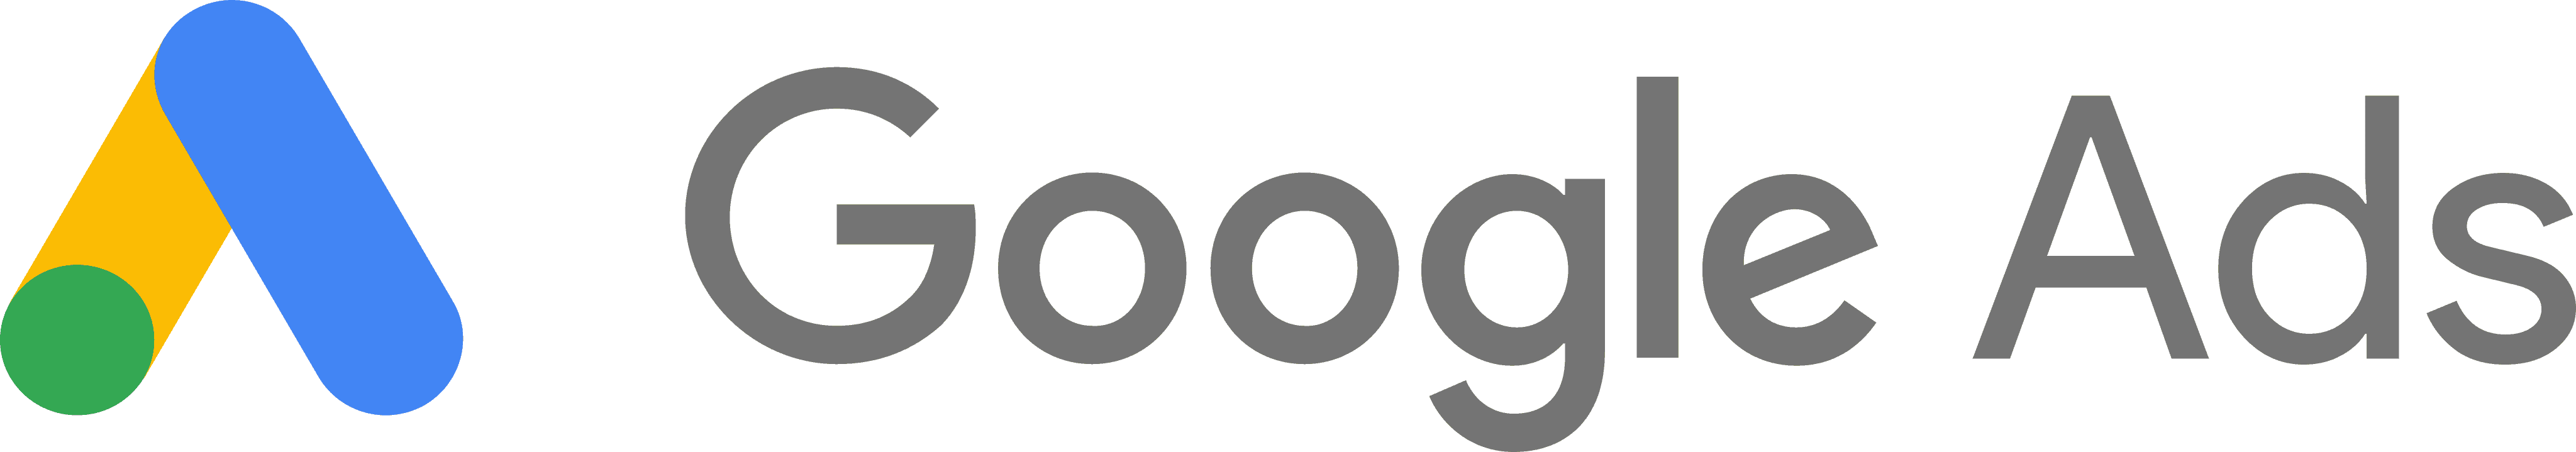 Posicionamiento web google ads